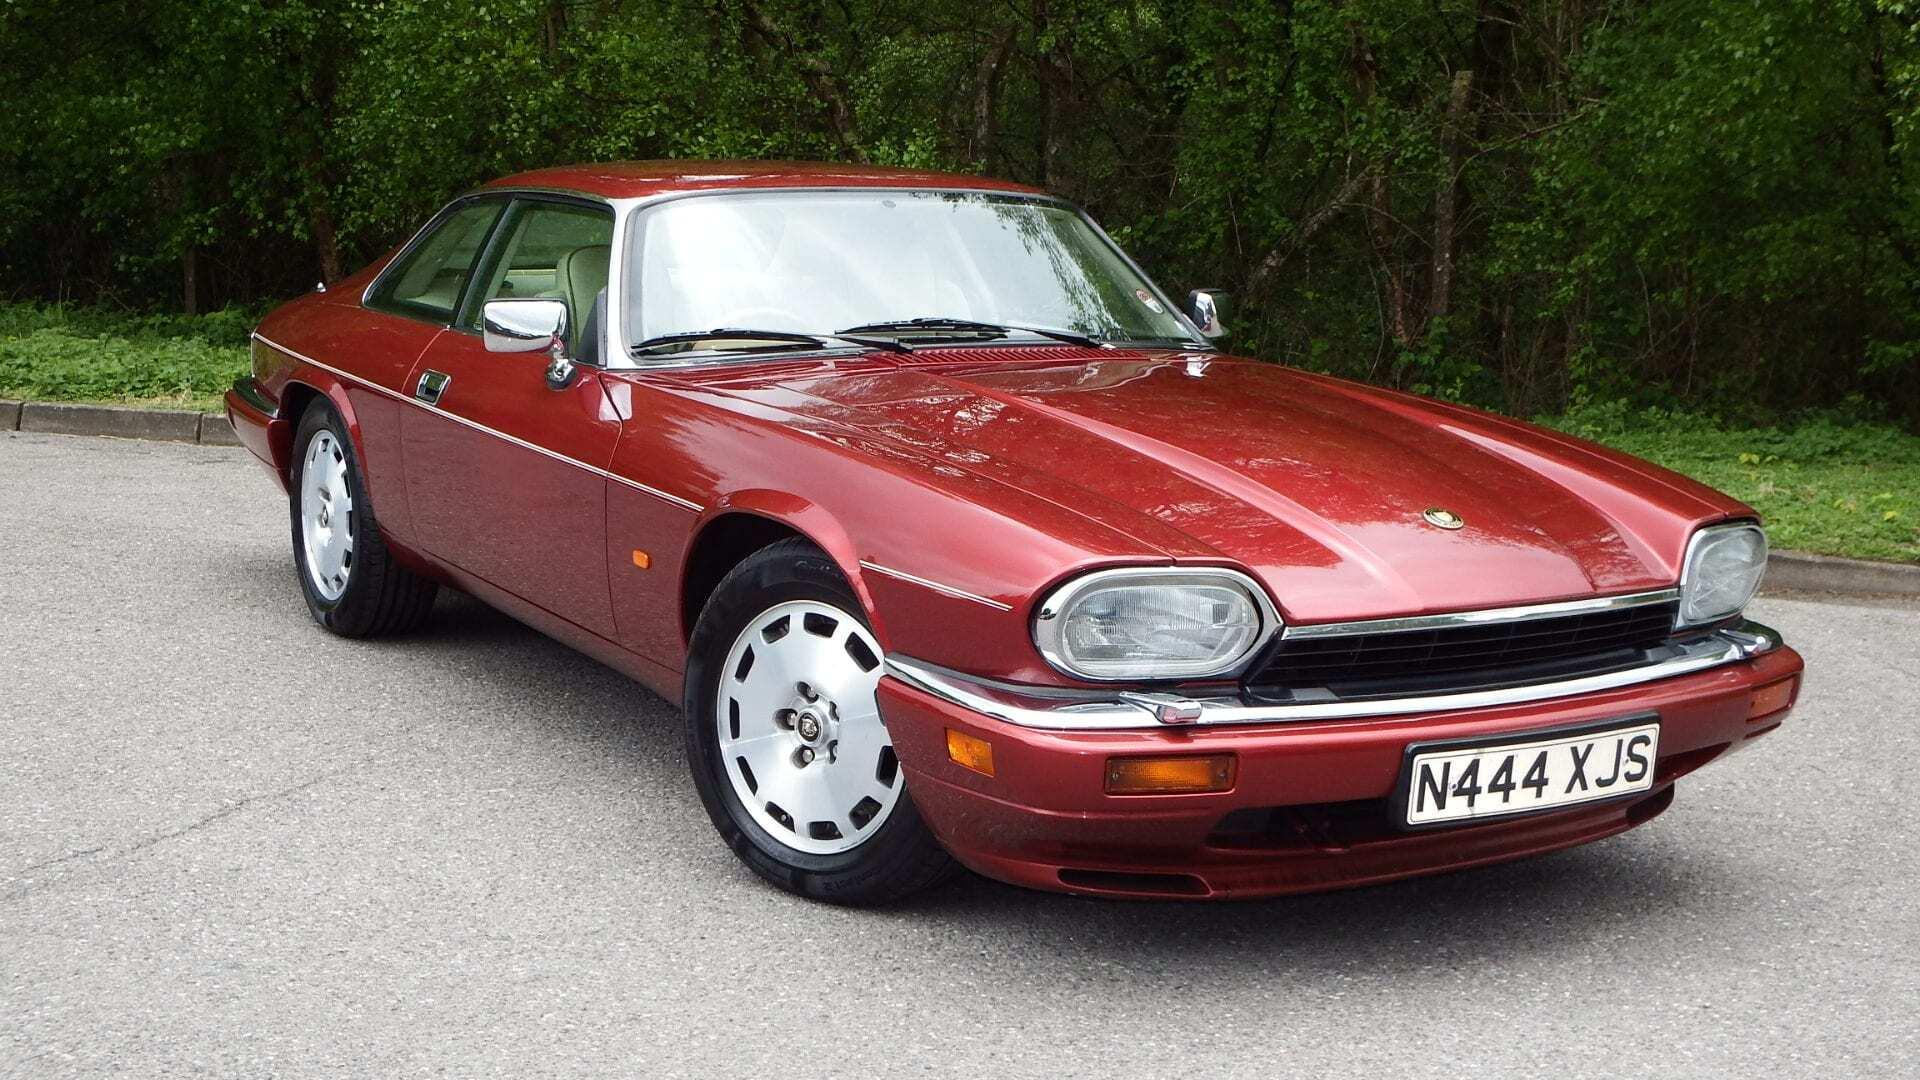 Jaguar Xjs For Sale From Kwe Xjs Amp Xj From Kwe Cars